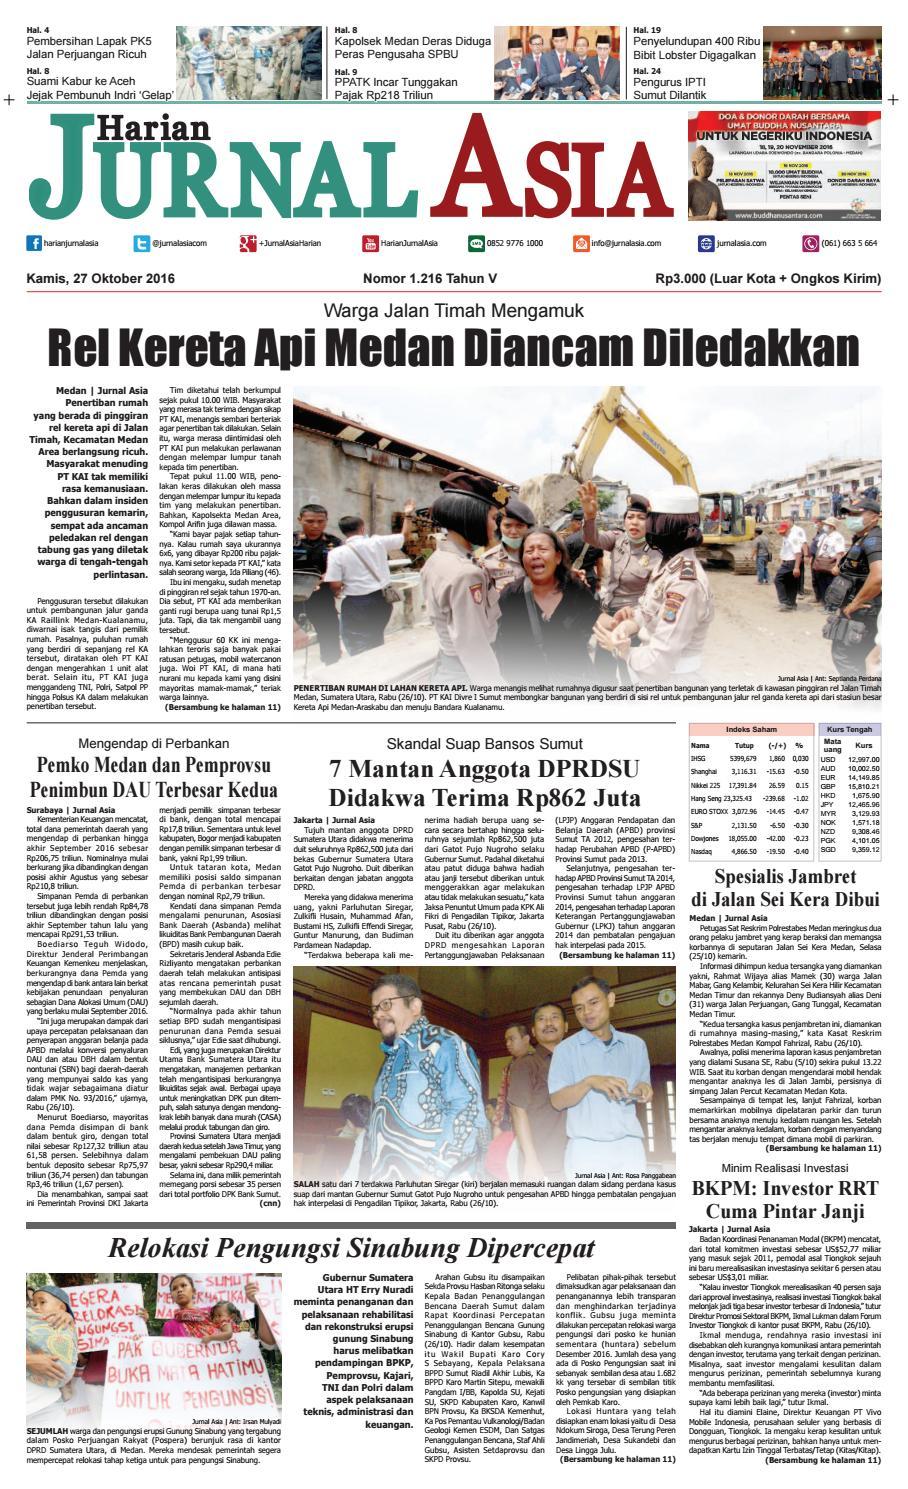 Harian Jurnal Asia Edisi Kamis 27 Oktober 2016 By Produk Ukm Bumn Tas Phiton Kombinasi Coklat Krem Medan Issuu